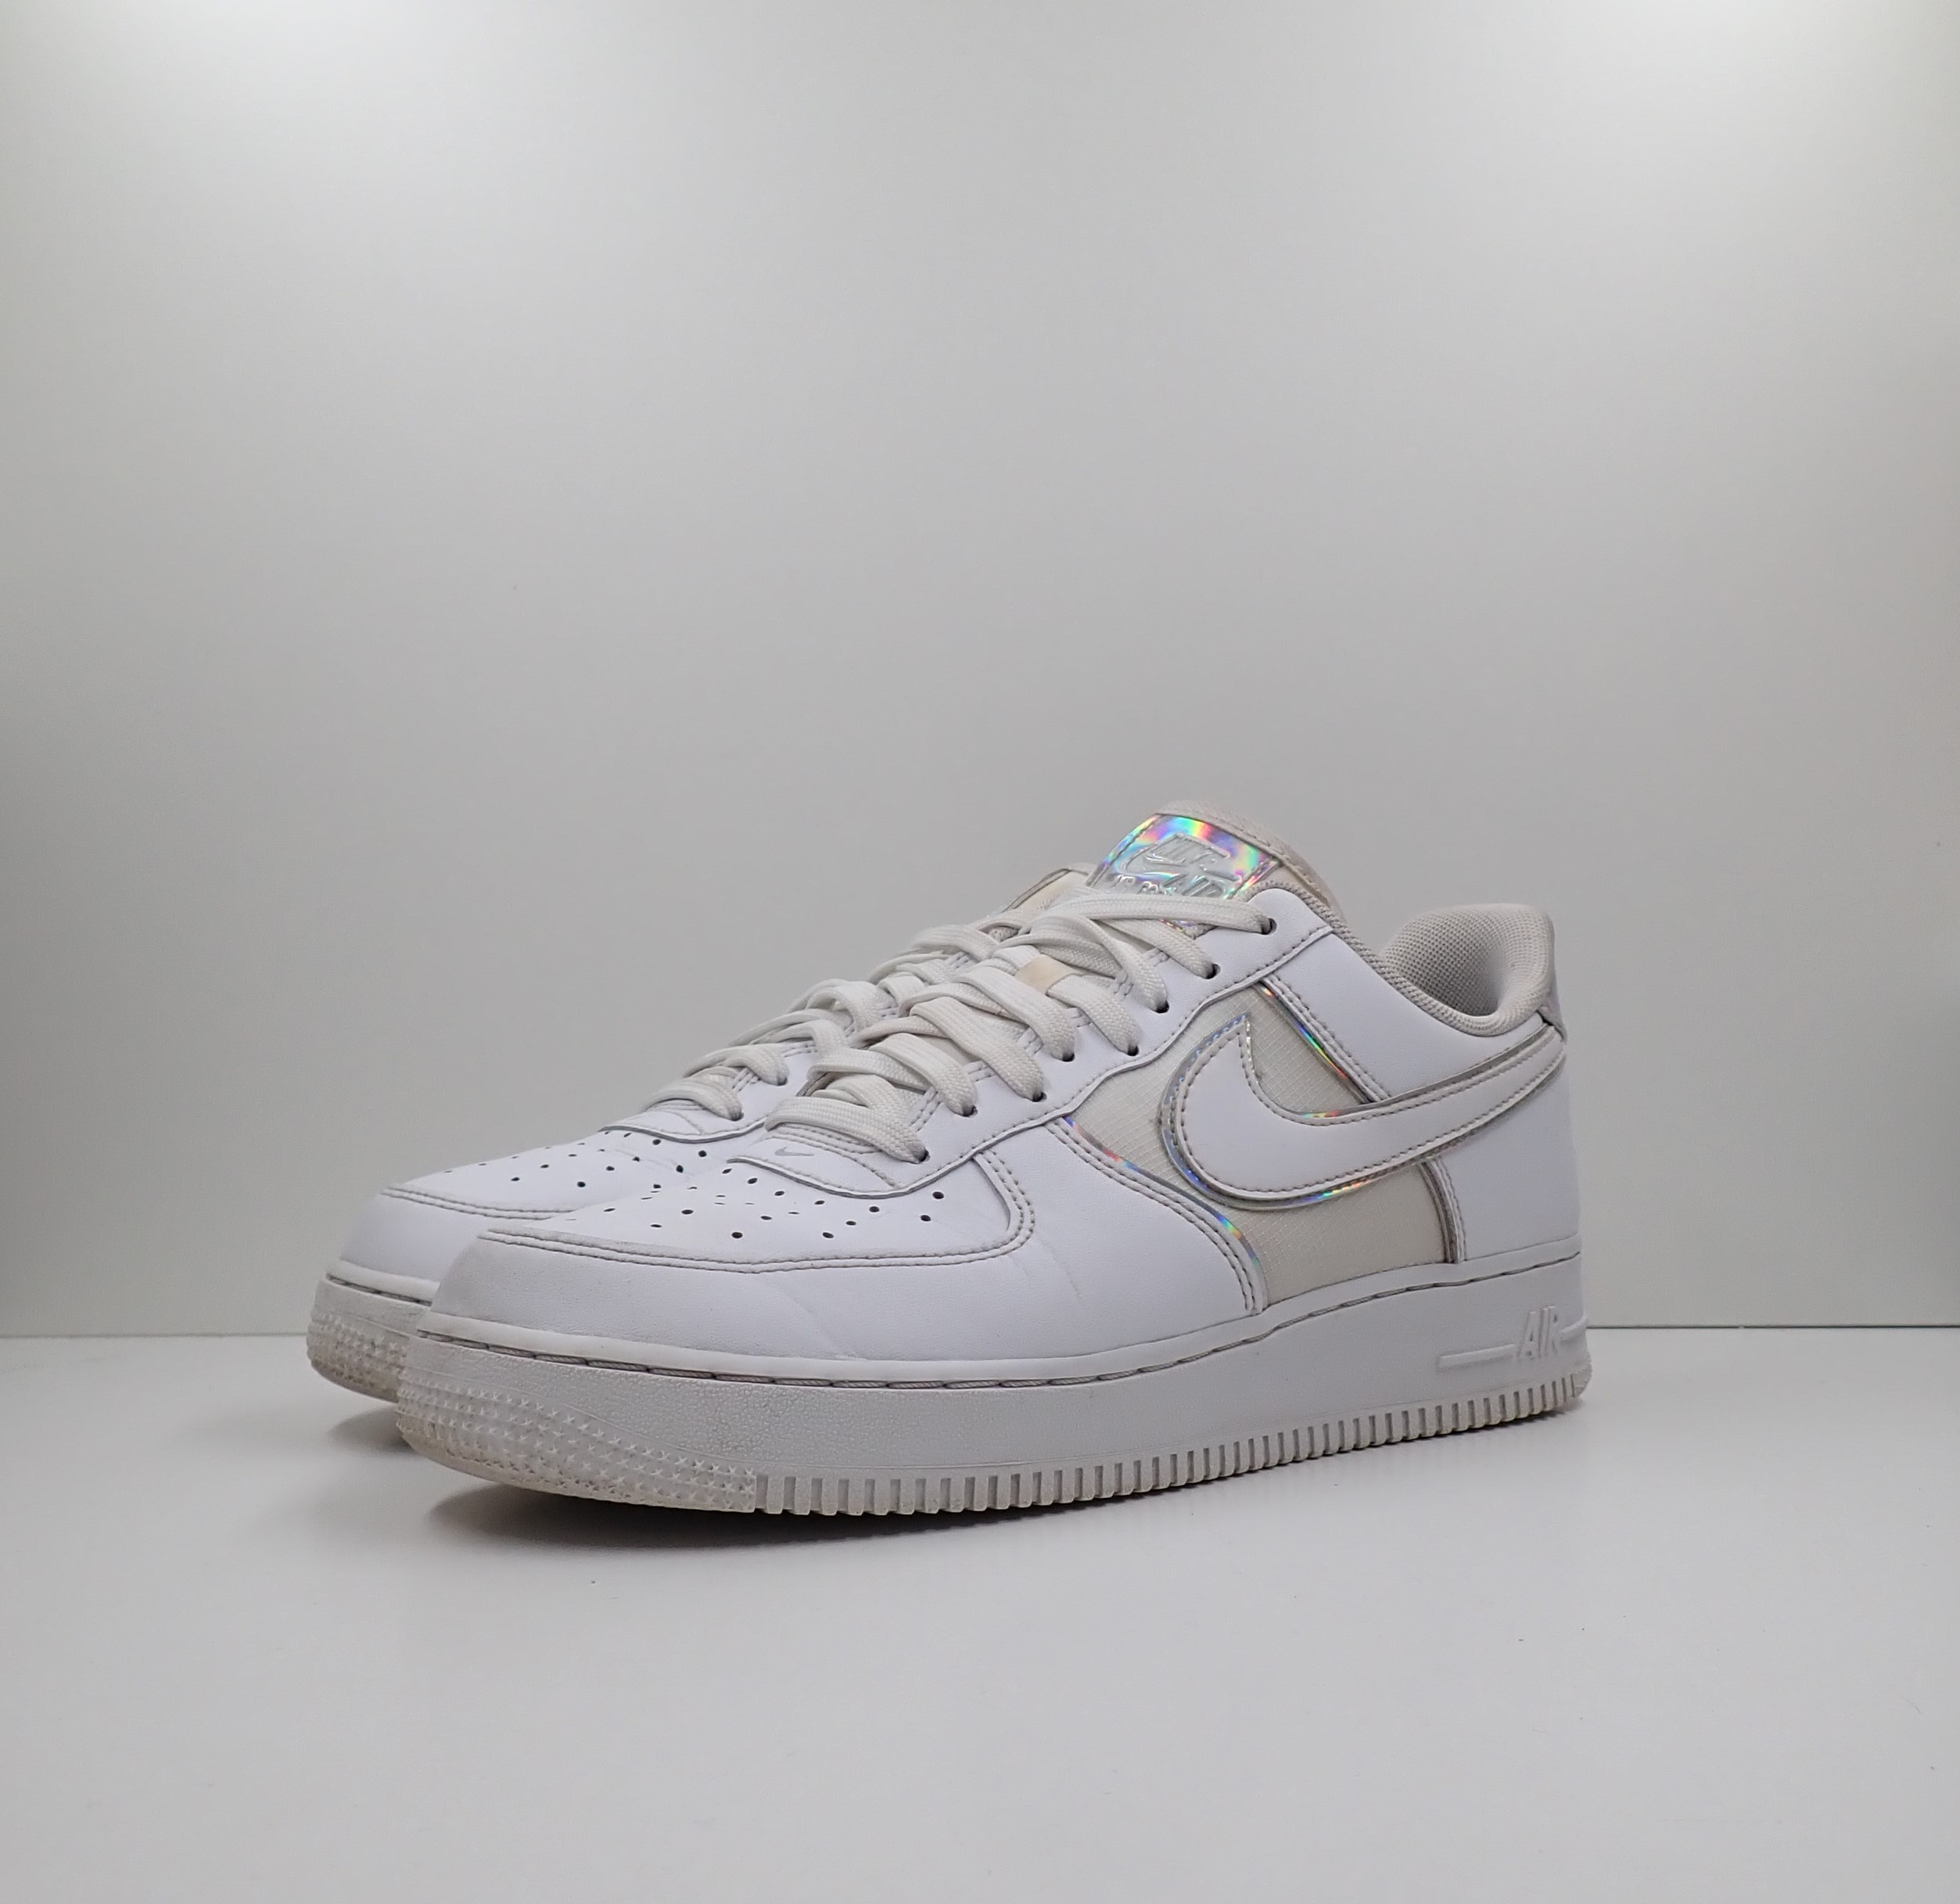 Nike Air Force 1 '07 LV8 4 White Silver